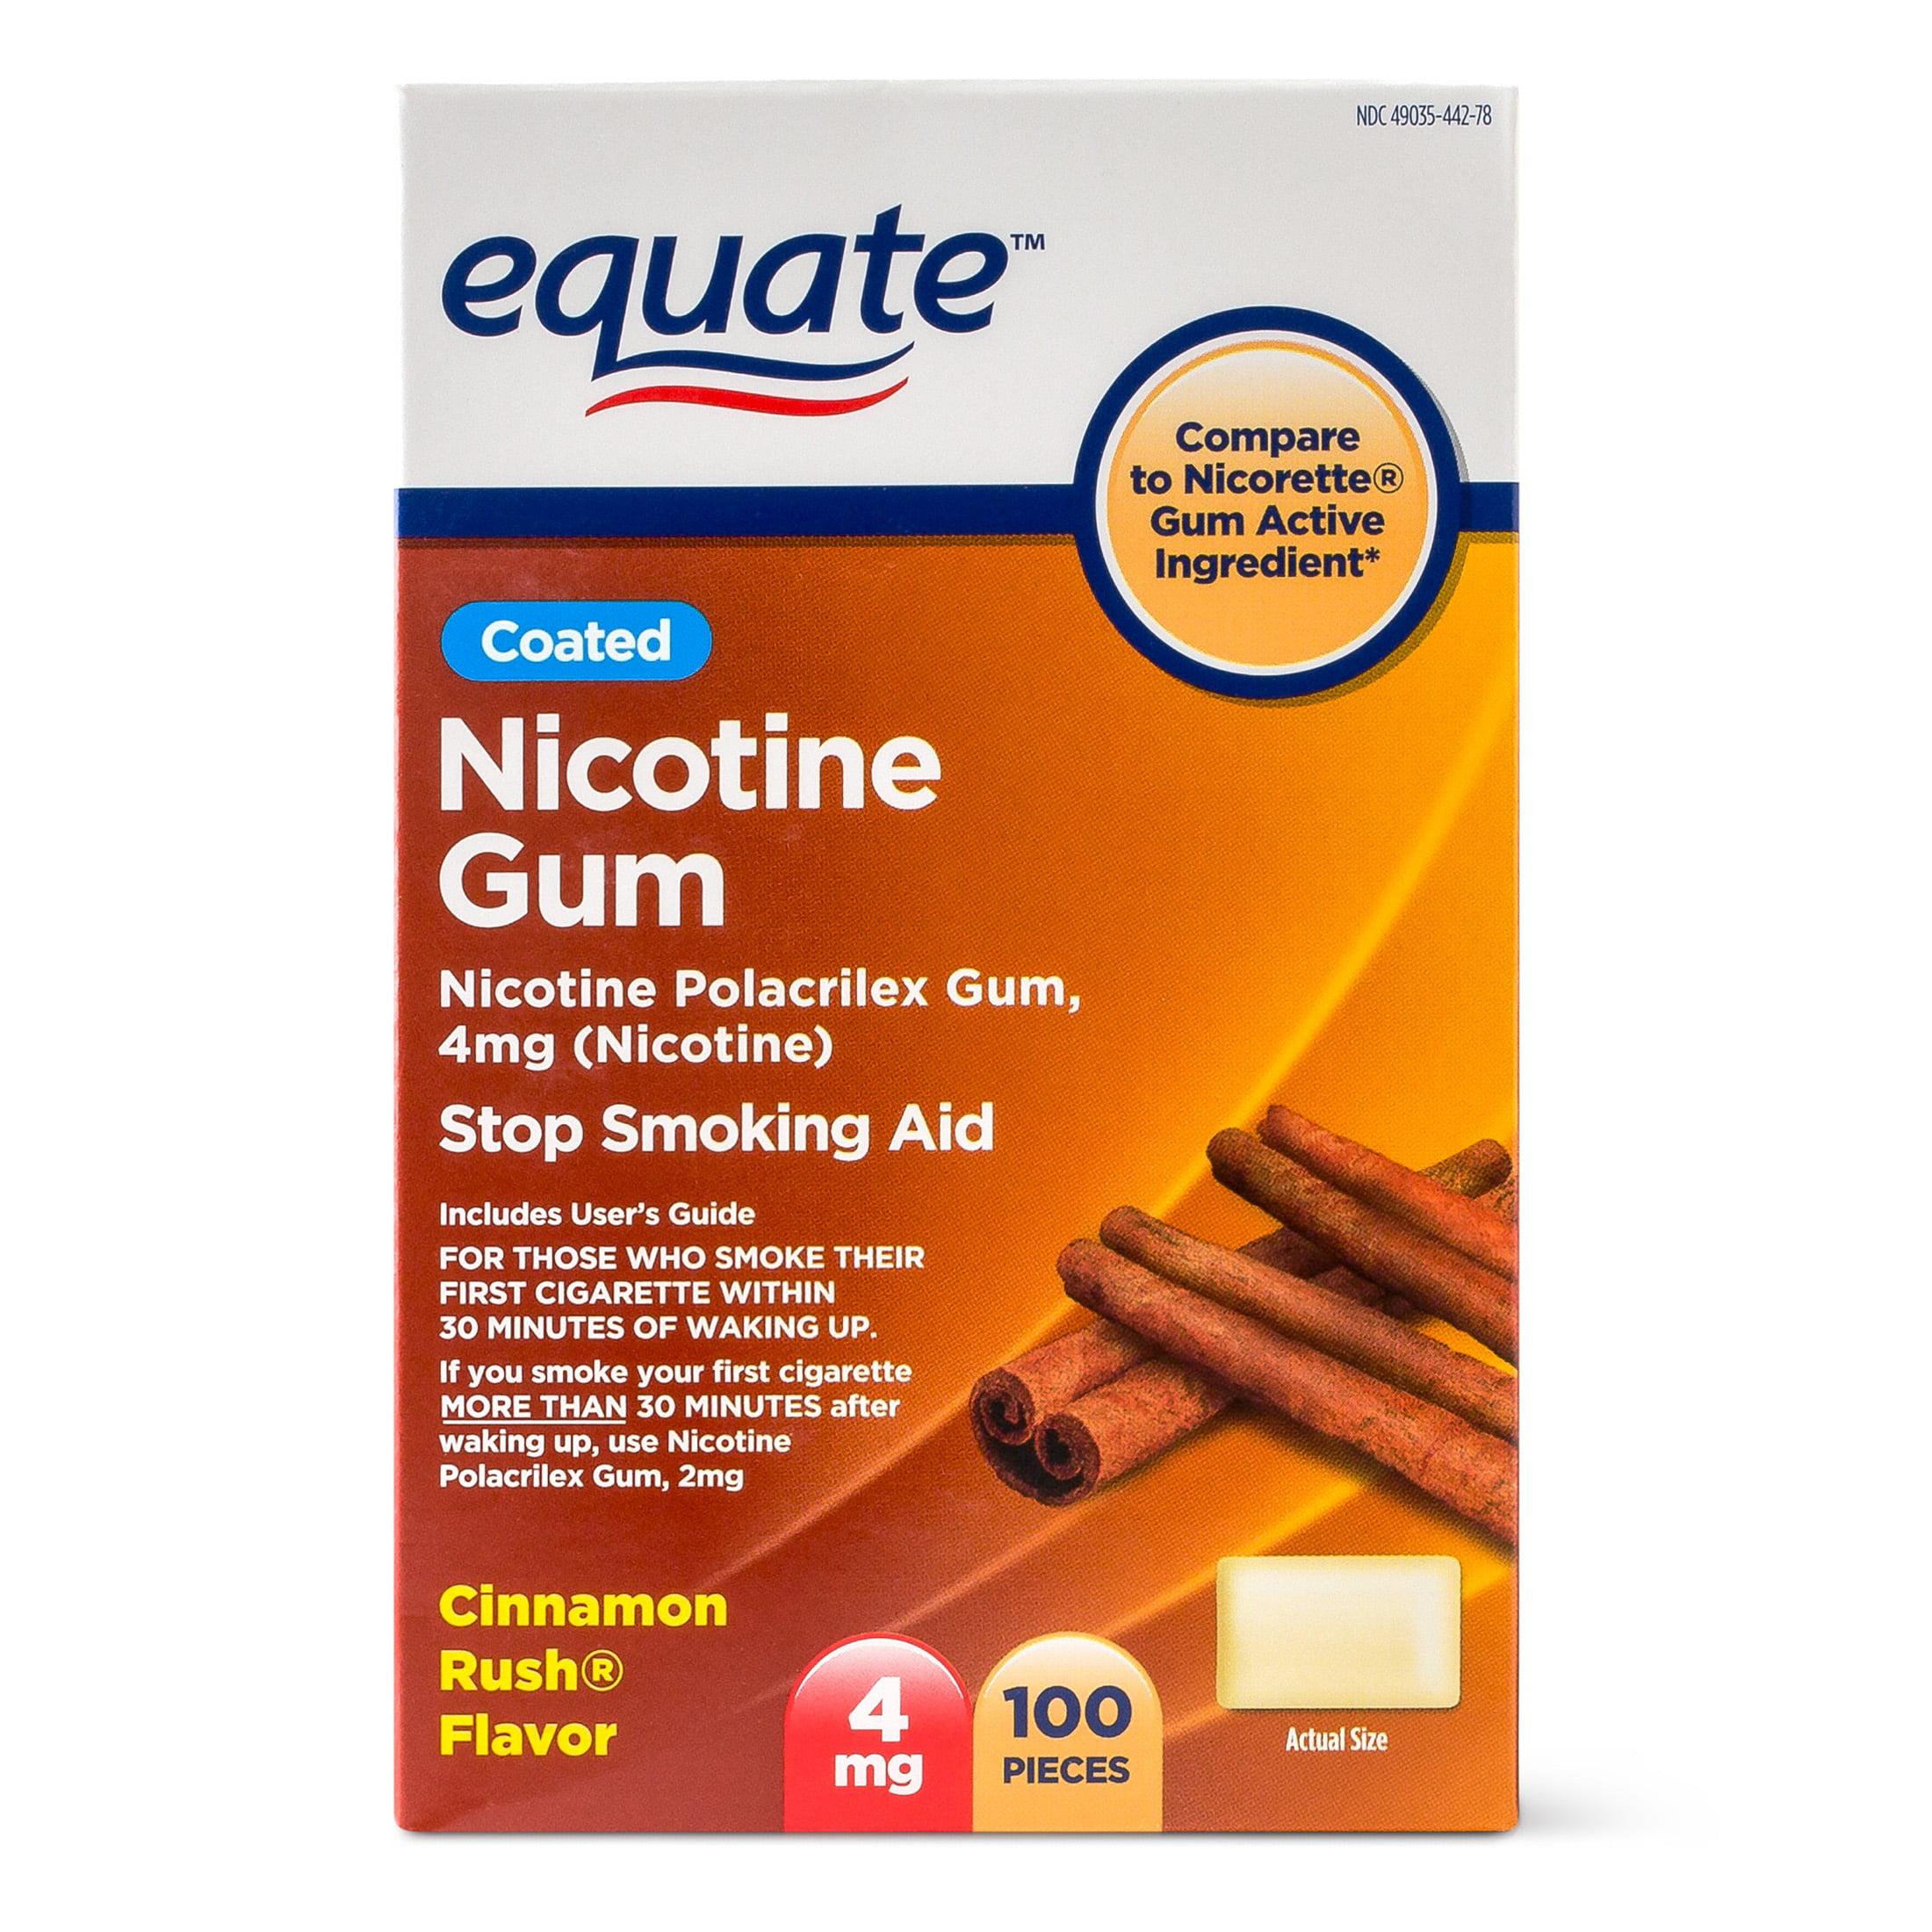 Equate Coated Nicotine Gum, Cinnamon Rush Flavor, 4 mg, 100 Ct